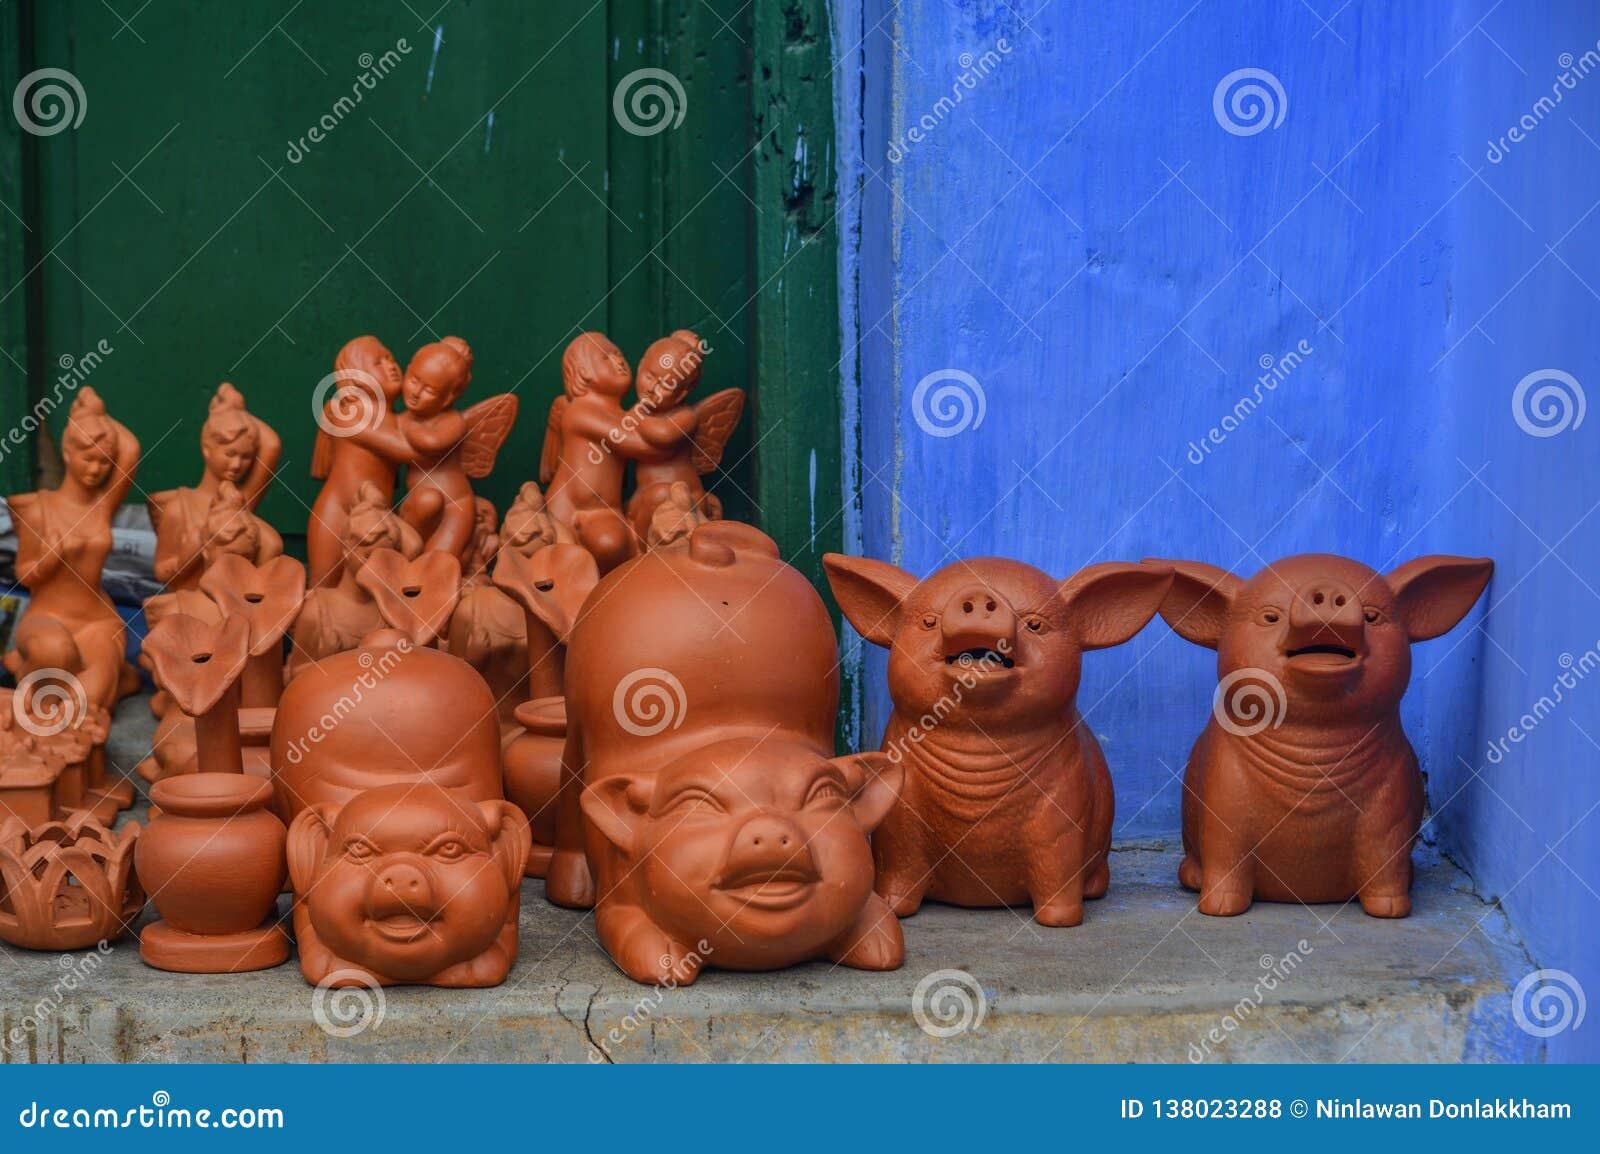 Ceramic pig toys at Hoi An Old Town, Vietnam